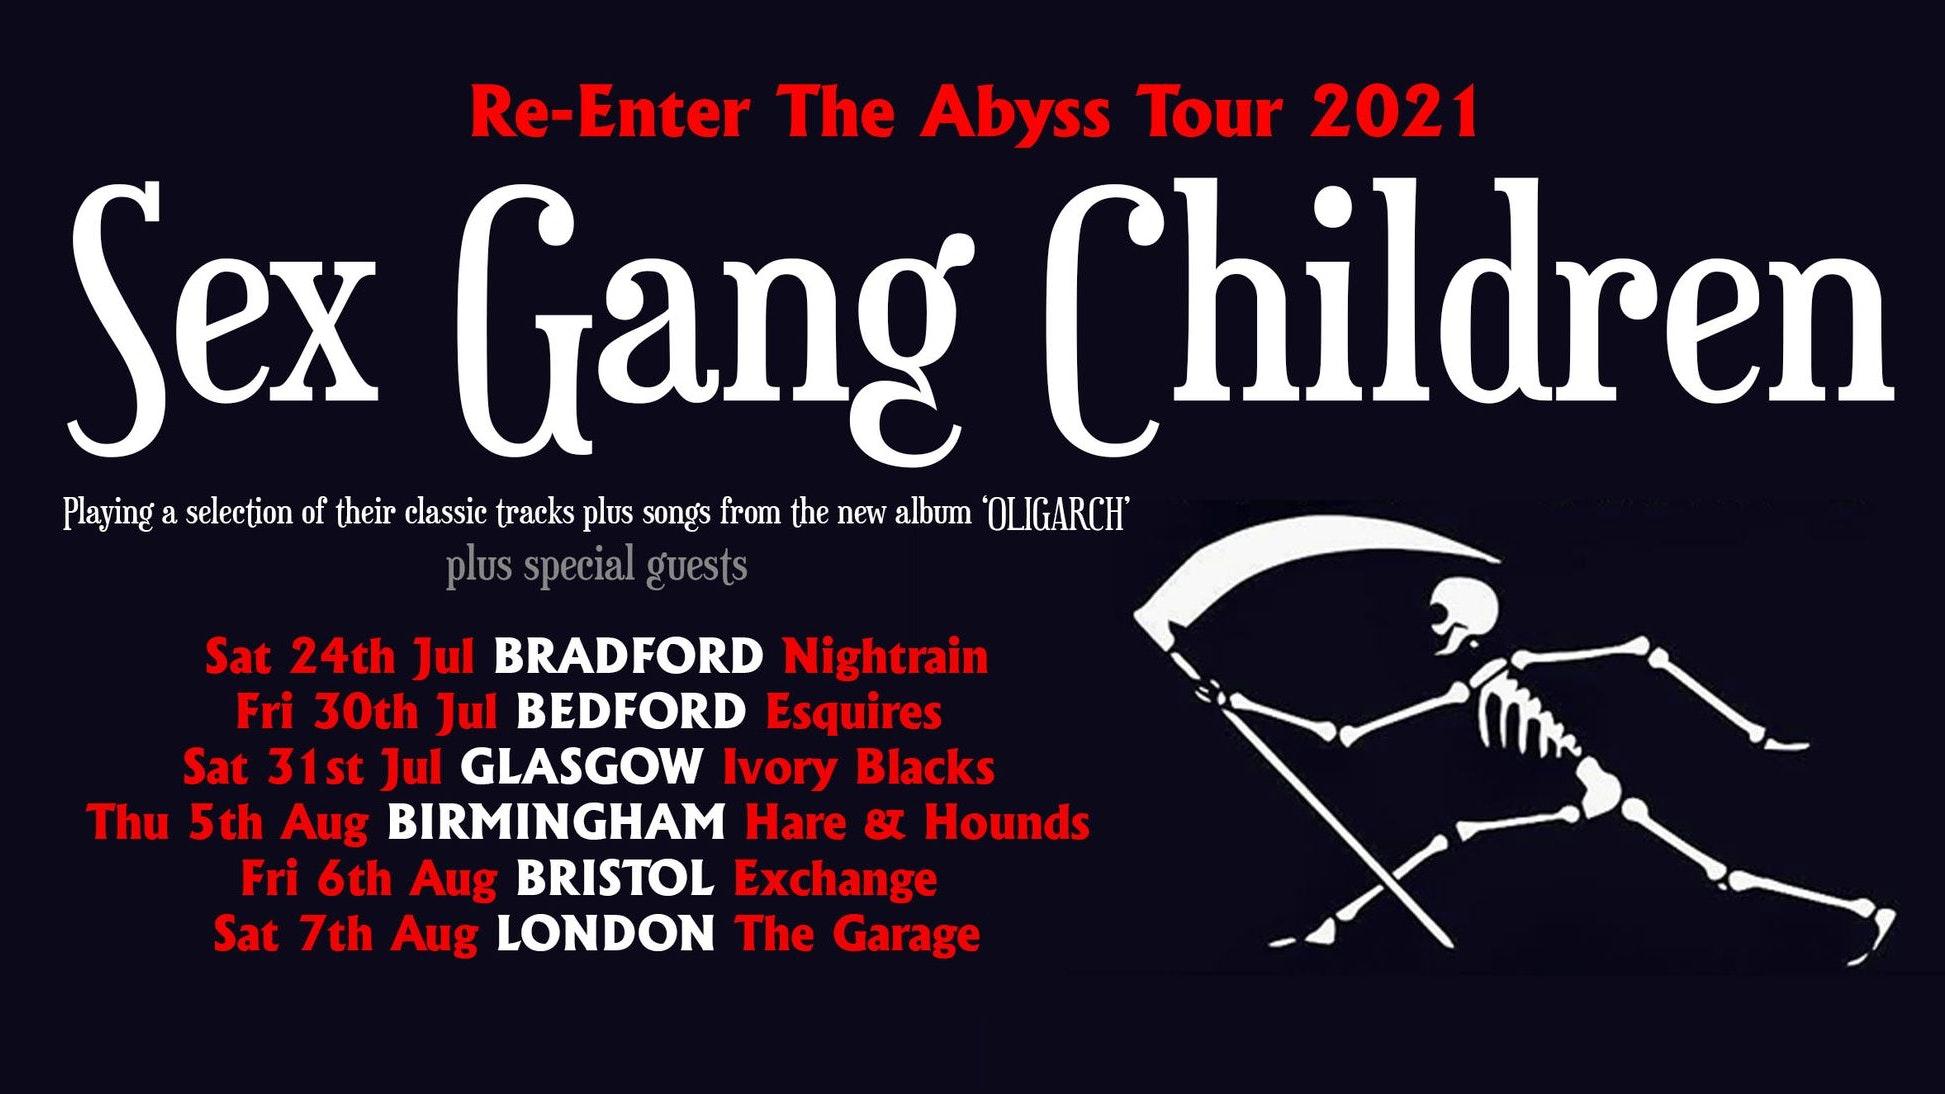 Sex Gang Children Re-Enter The Abyss Tour 2021 – Bristol